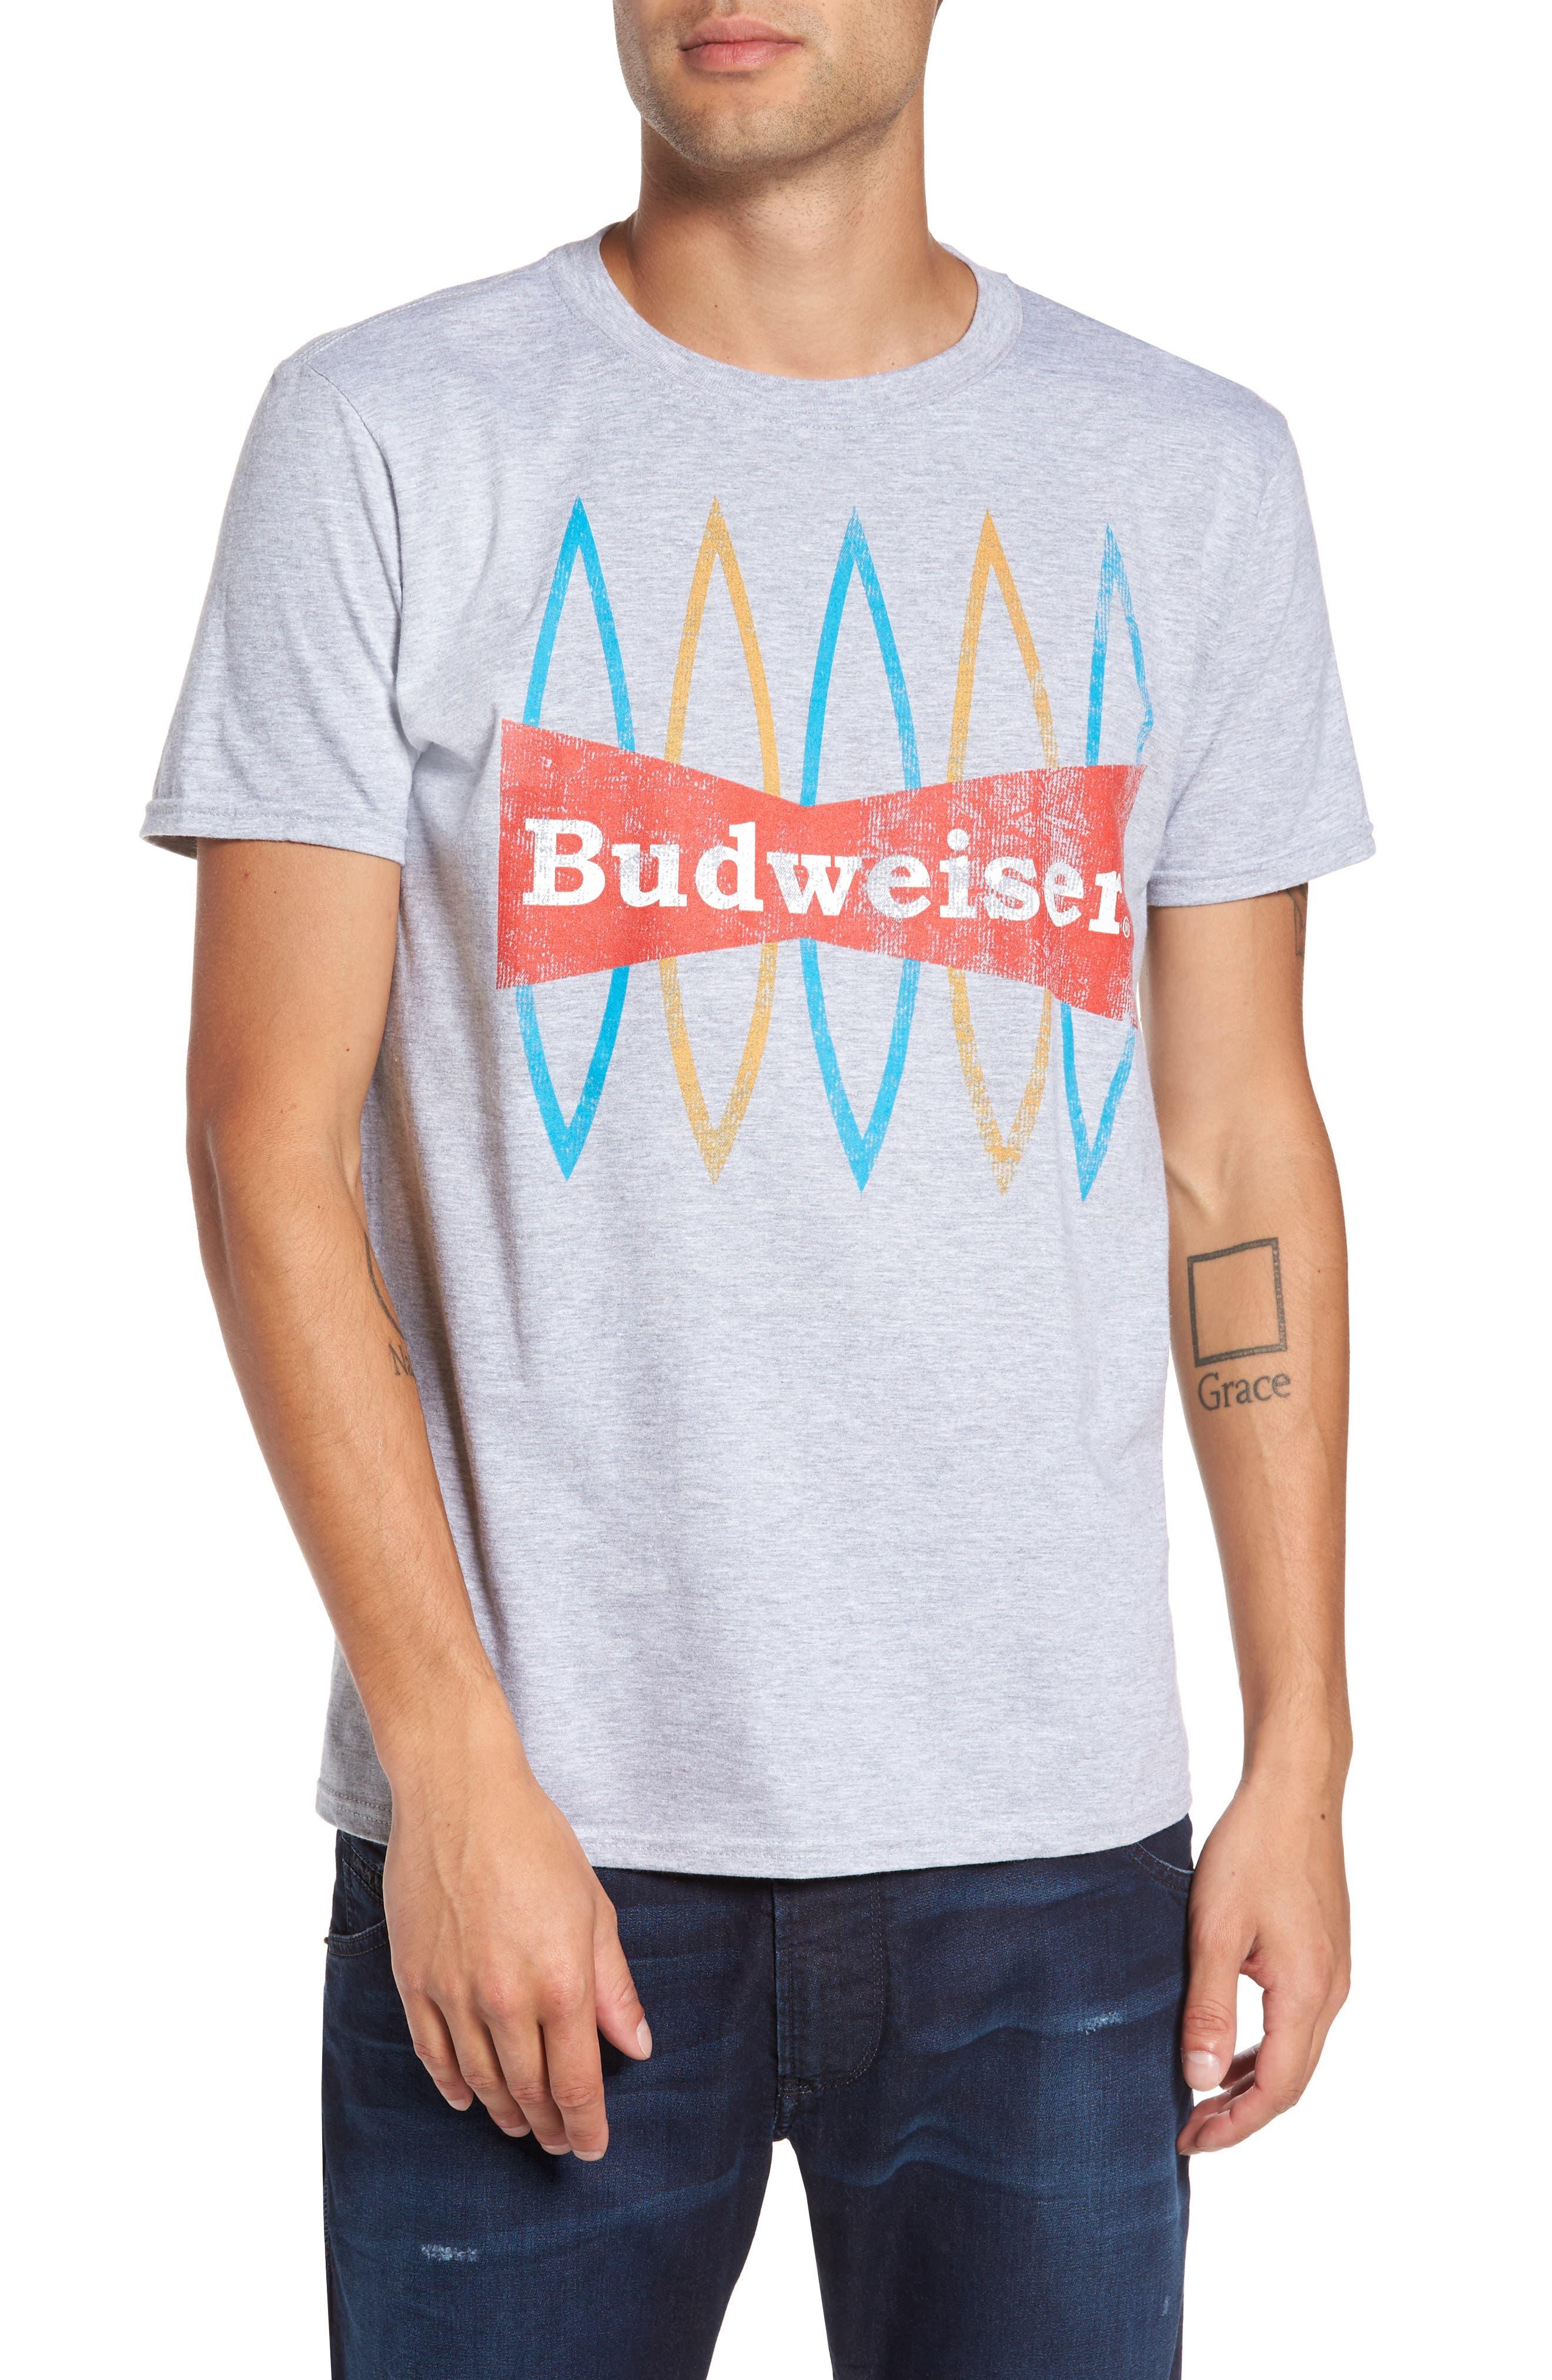 Budweiser<sup>®</sup> T-Shirt,                             Main thumbnail 1, color,                             Grey Bud Surfboards